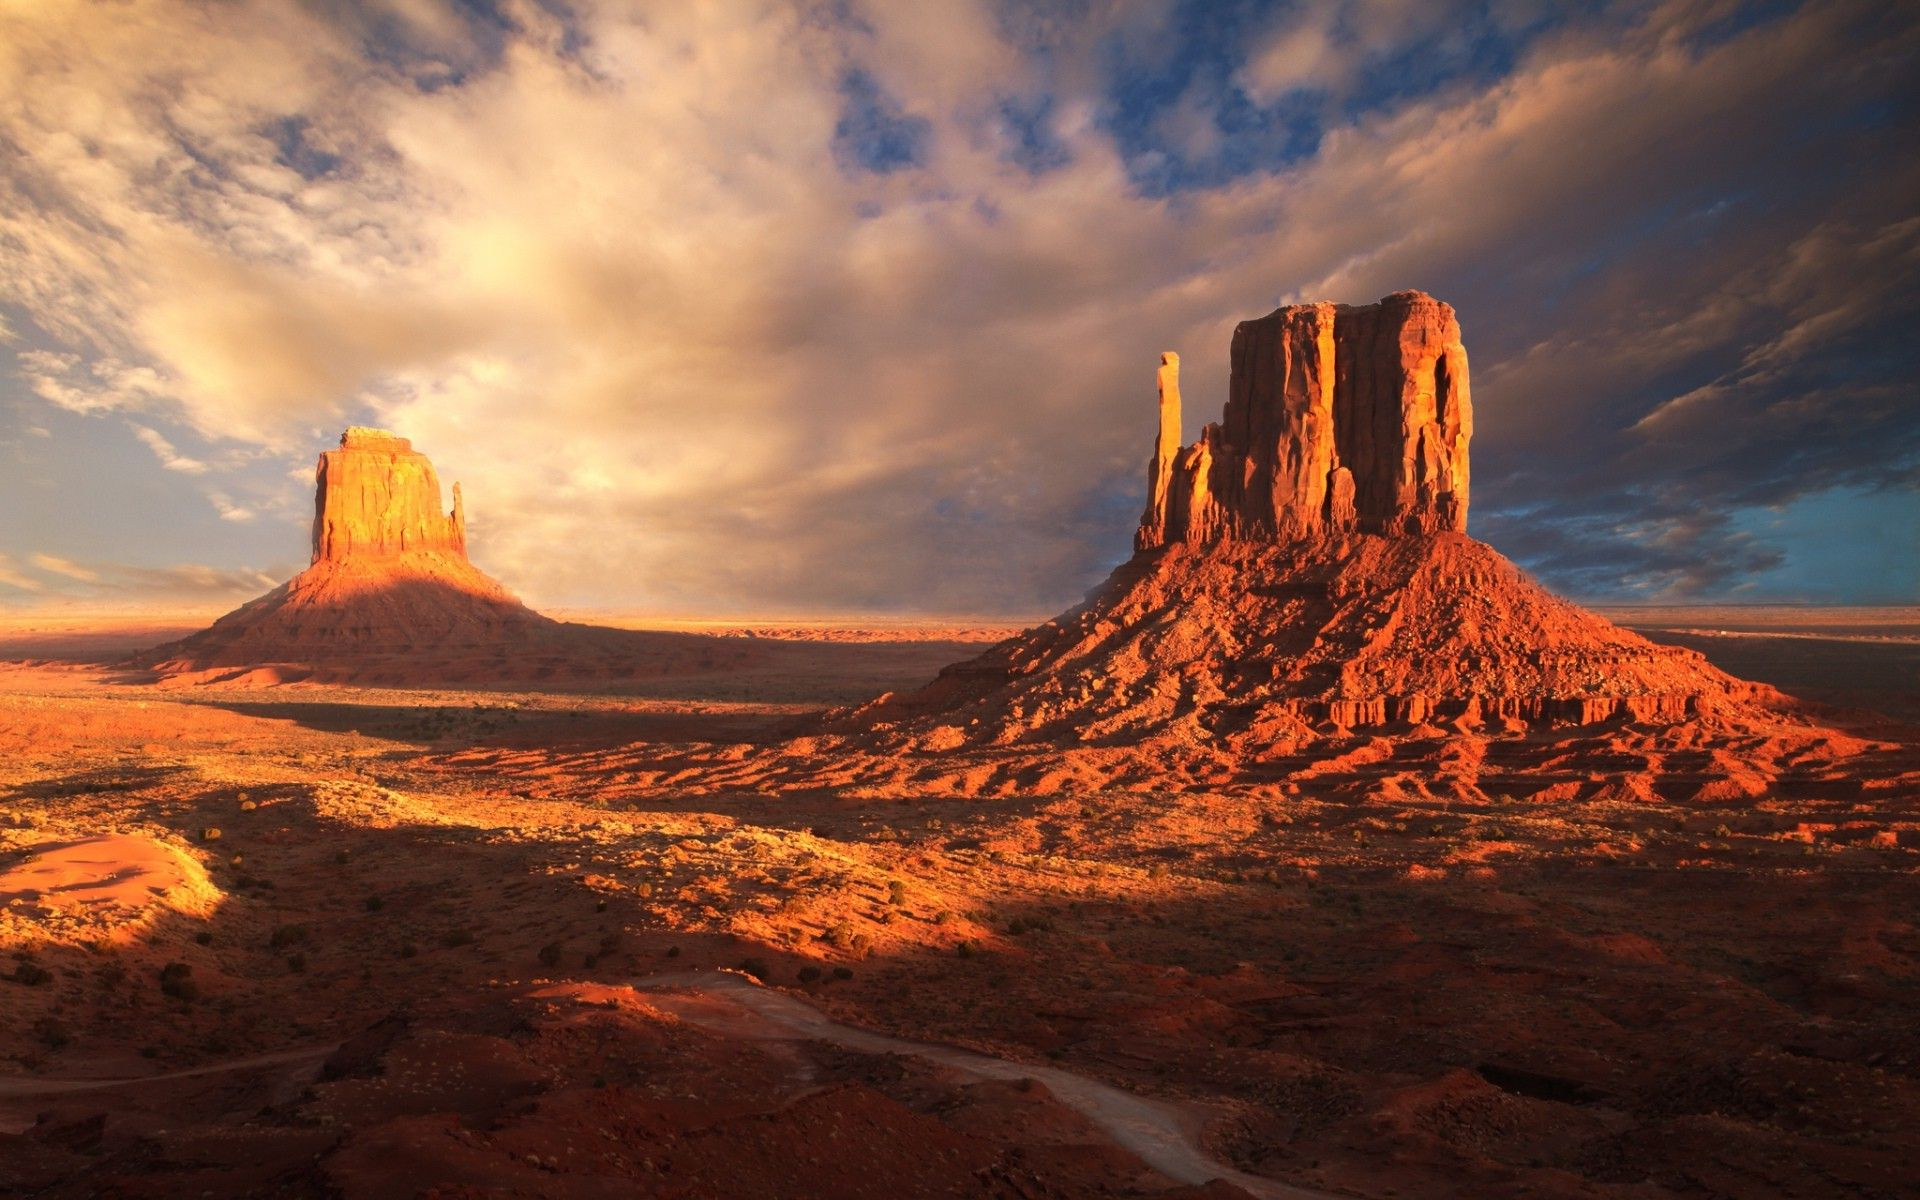 Landscape Desert Nature Wallpapers Hd Desktop And Mobile Backgrounds Nature Nature Wallpaper Landscape